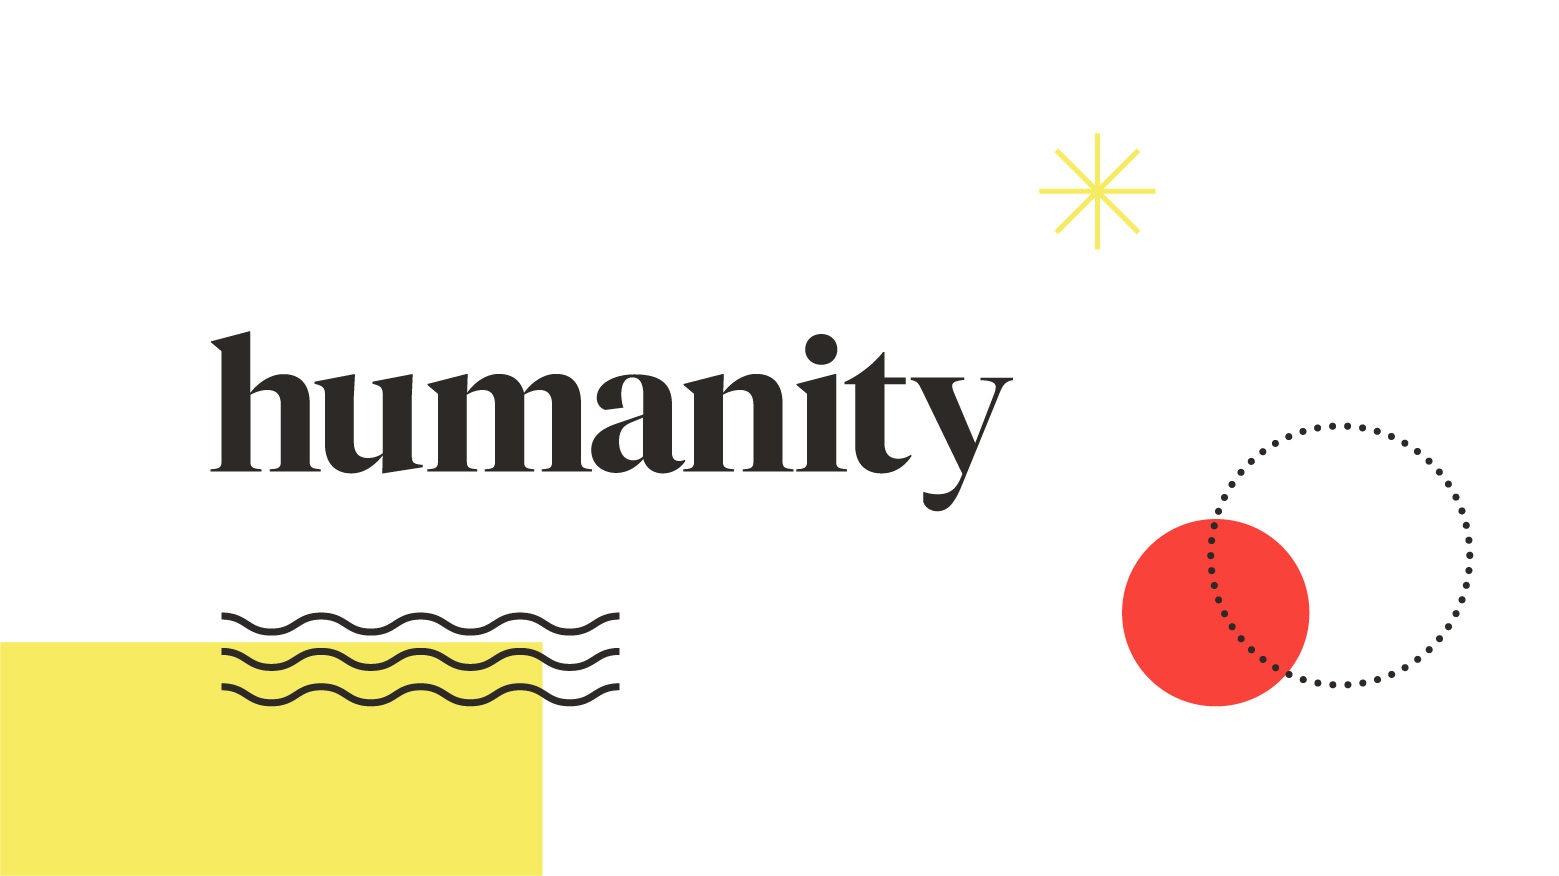 humanity_pressrelease__Strategy[13][2]